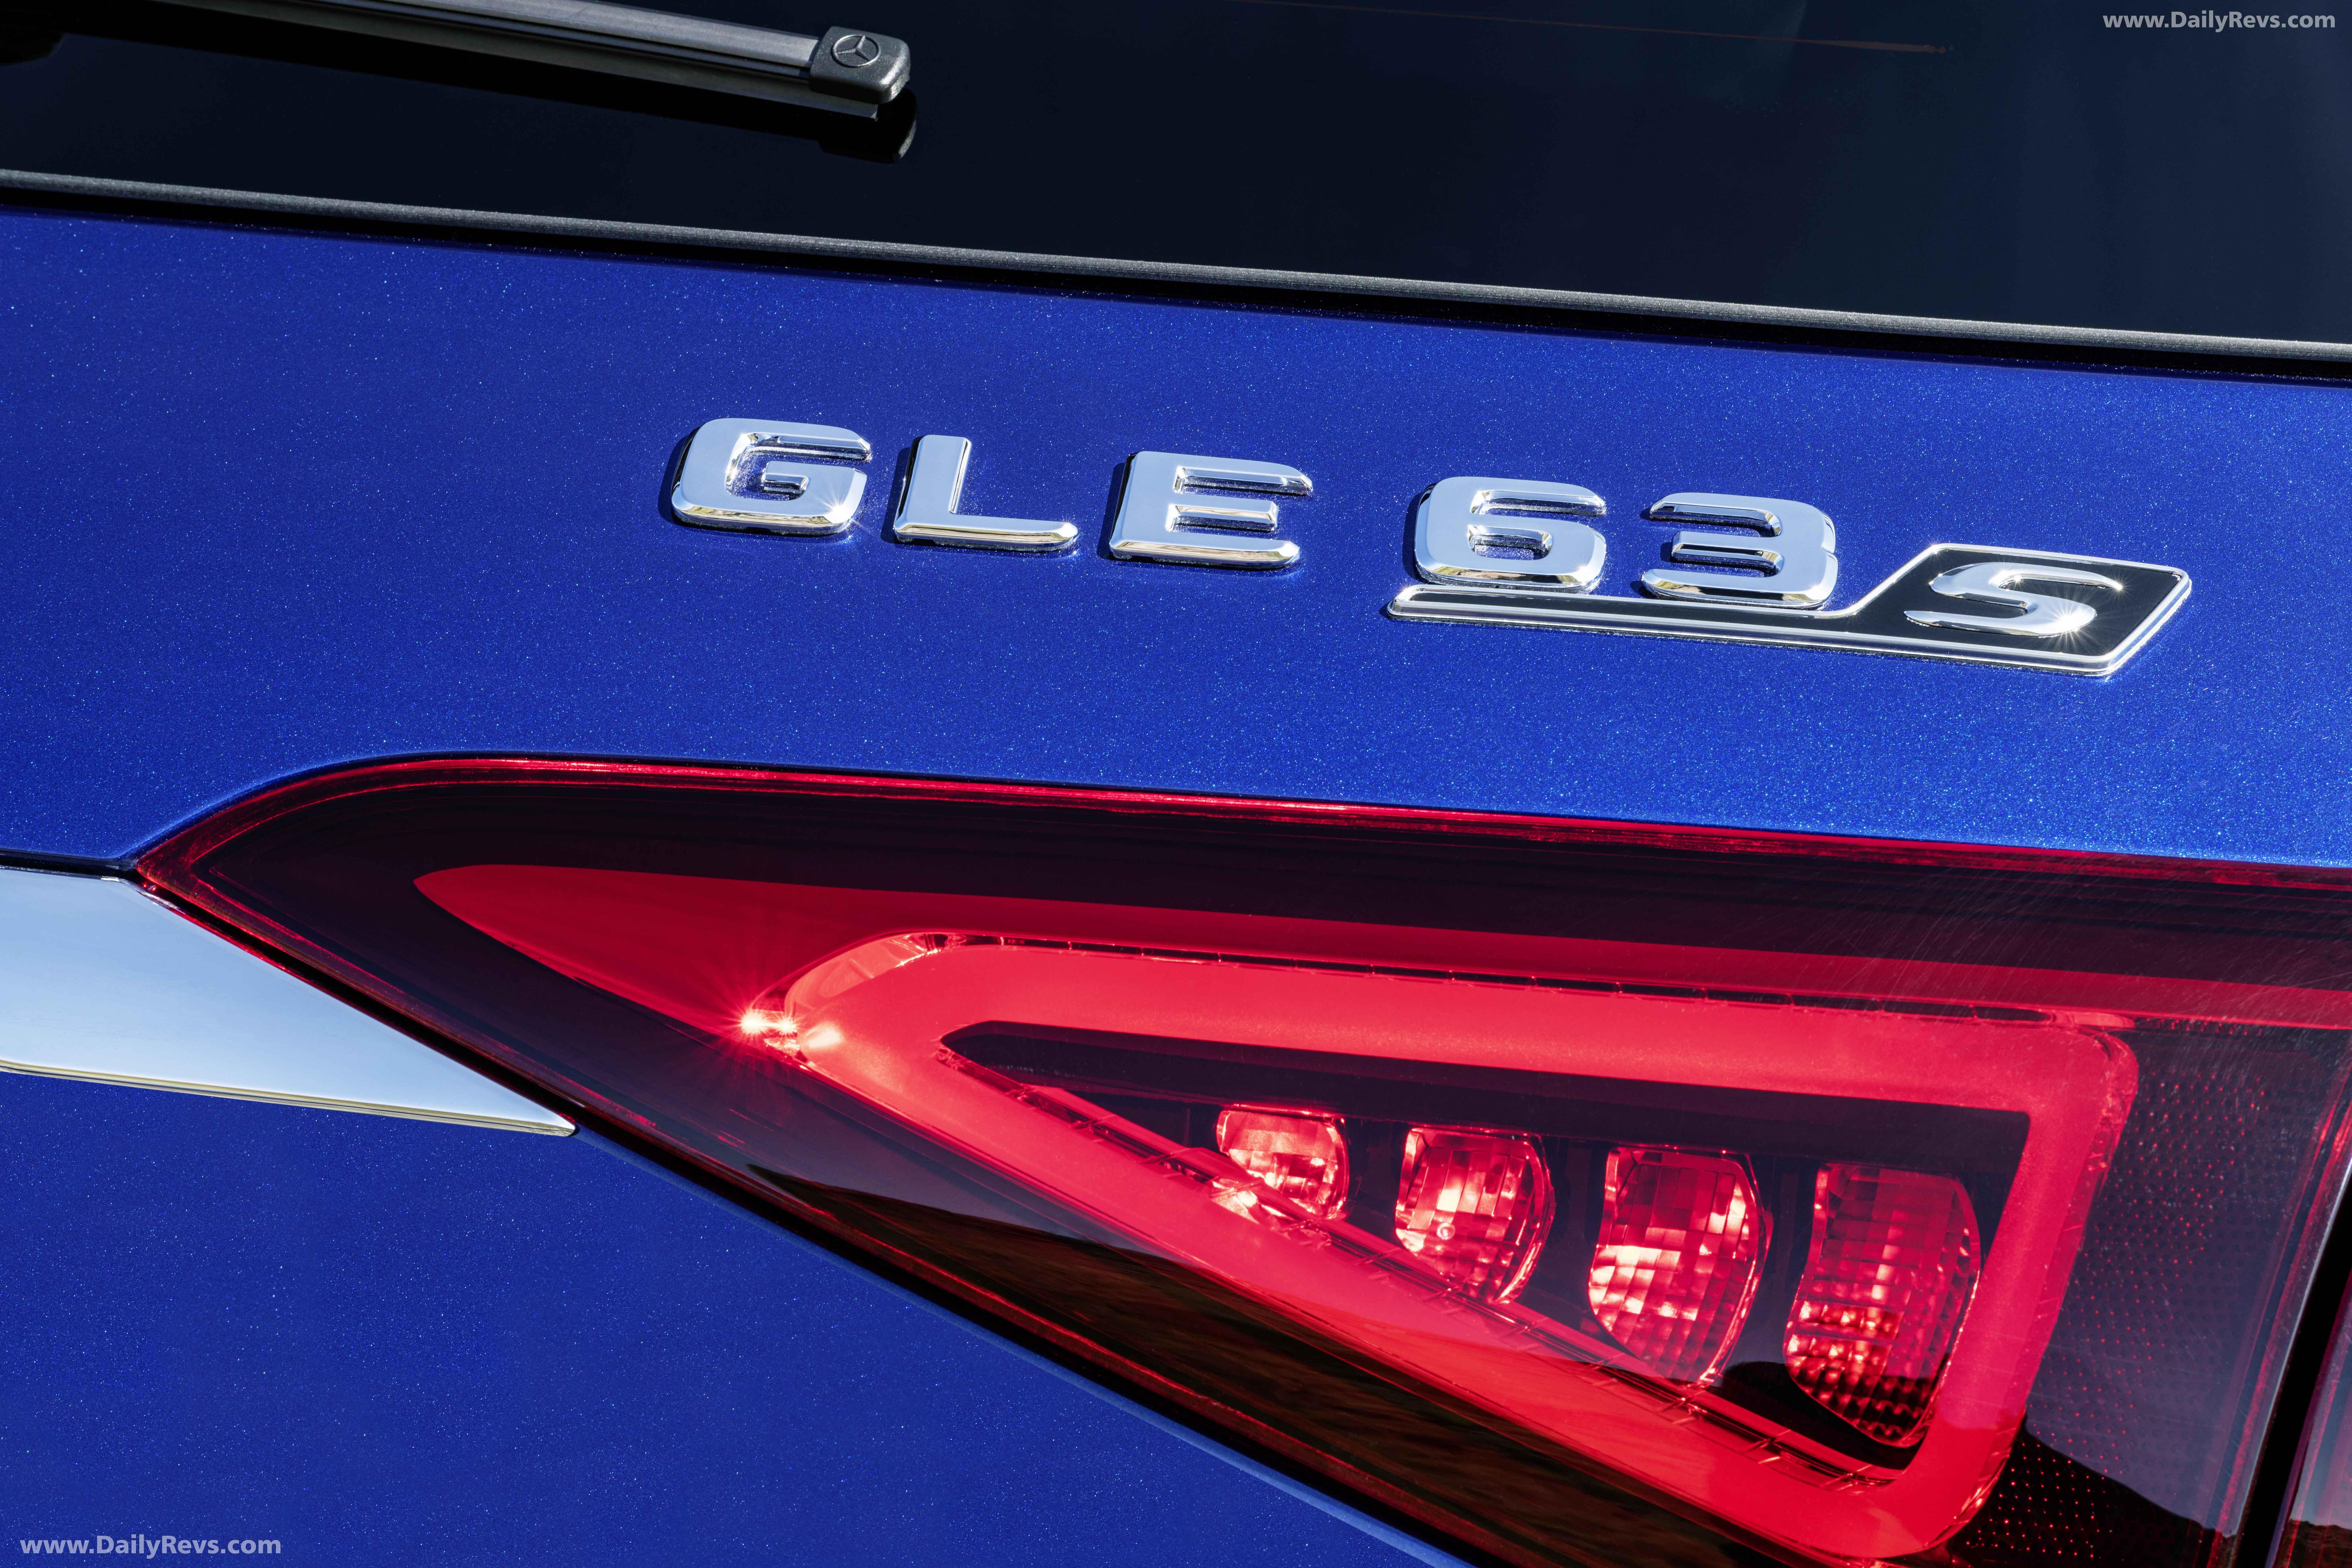 2021 Mercedes-Benz GLE63 S AMG full